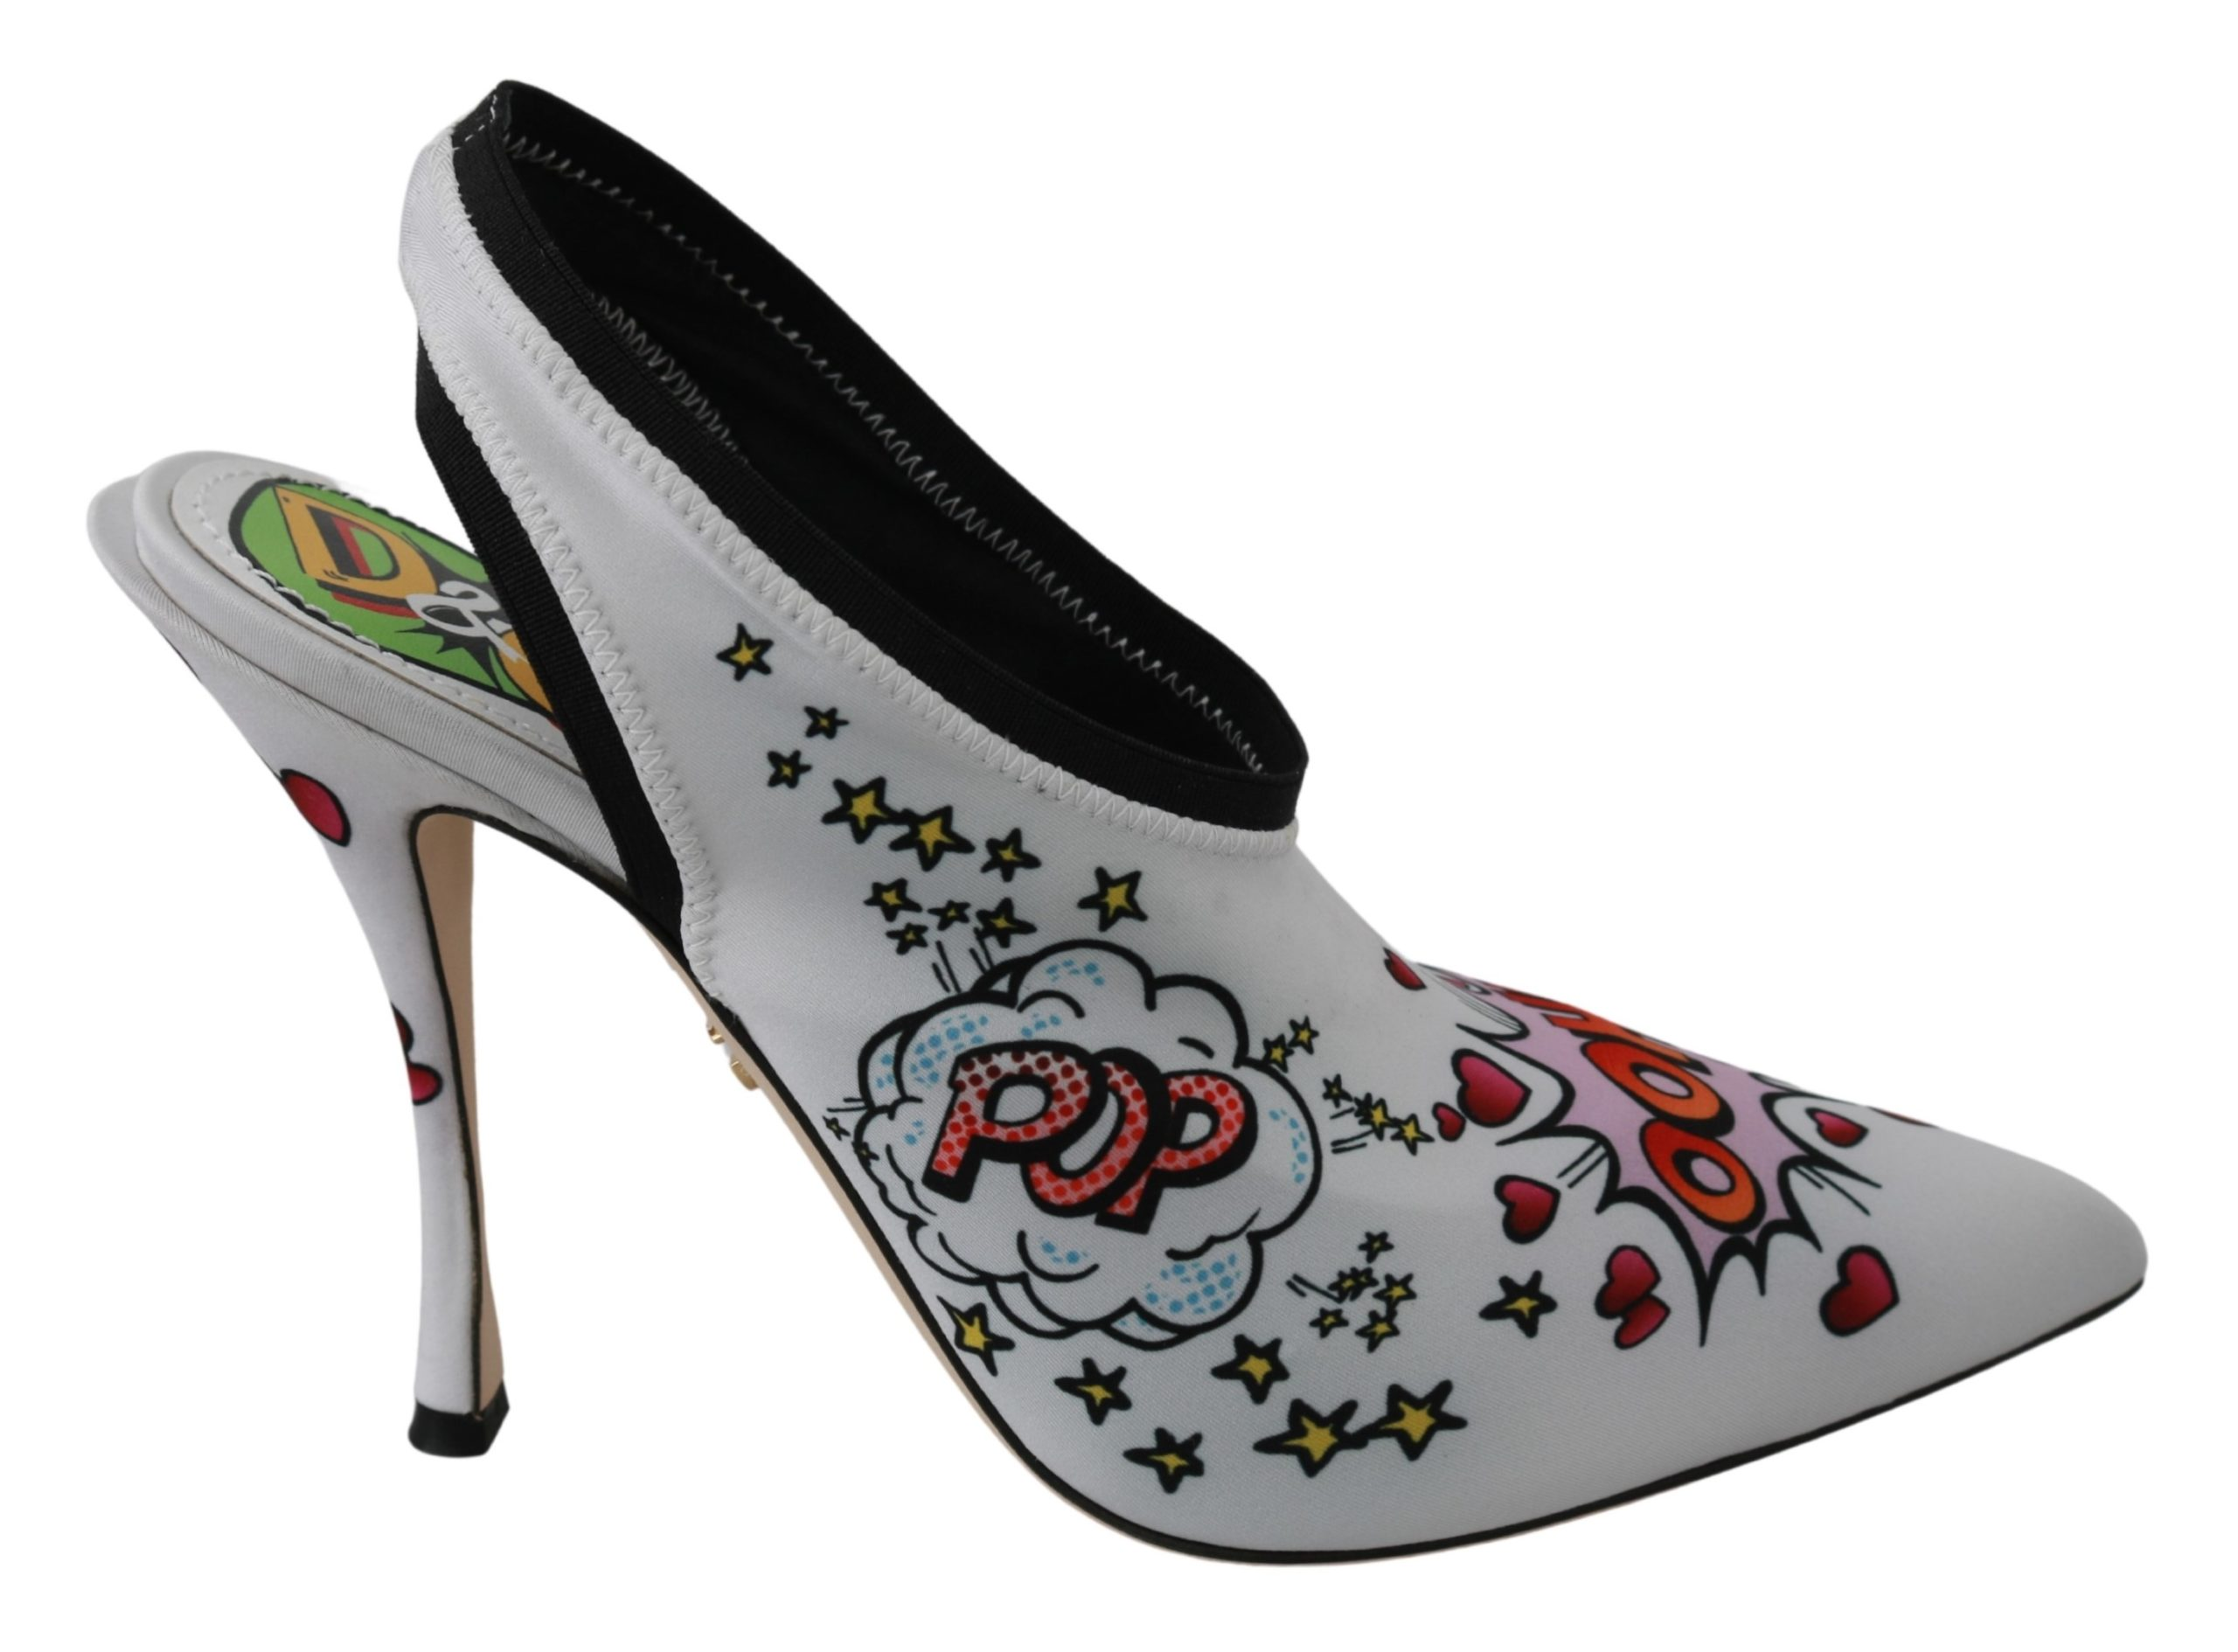 Dolce & Gabbana Women's Neoprene Stretch Pumps Shoes White LA6476 - EU35/US4.5